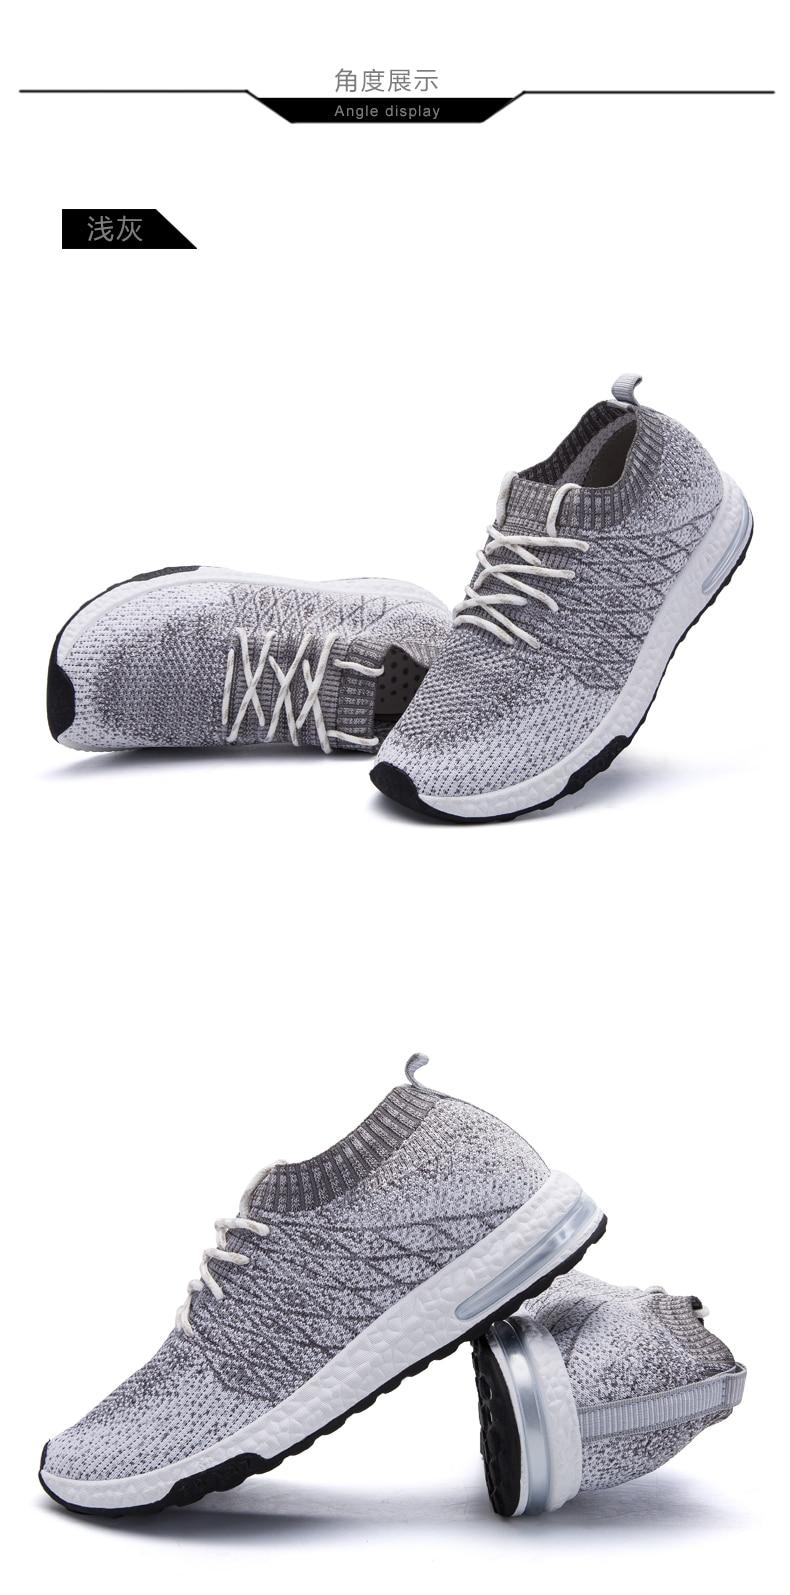 HTB1dnfPPhTpK1RjSZR0q6zEwXXaW Men Shoes Beathable Air Mesh Men Casual Shoes Slip on Fall Sock Shoes Men Sneakers Tenis Masculino Adulto Plus Size 46